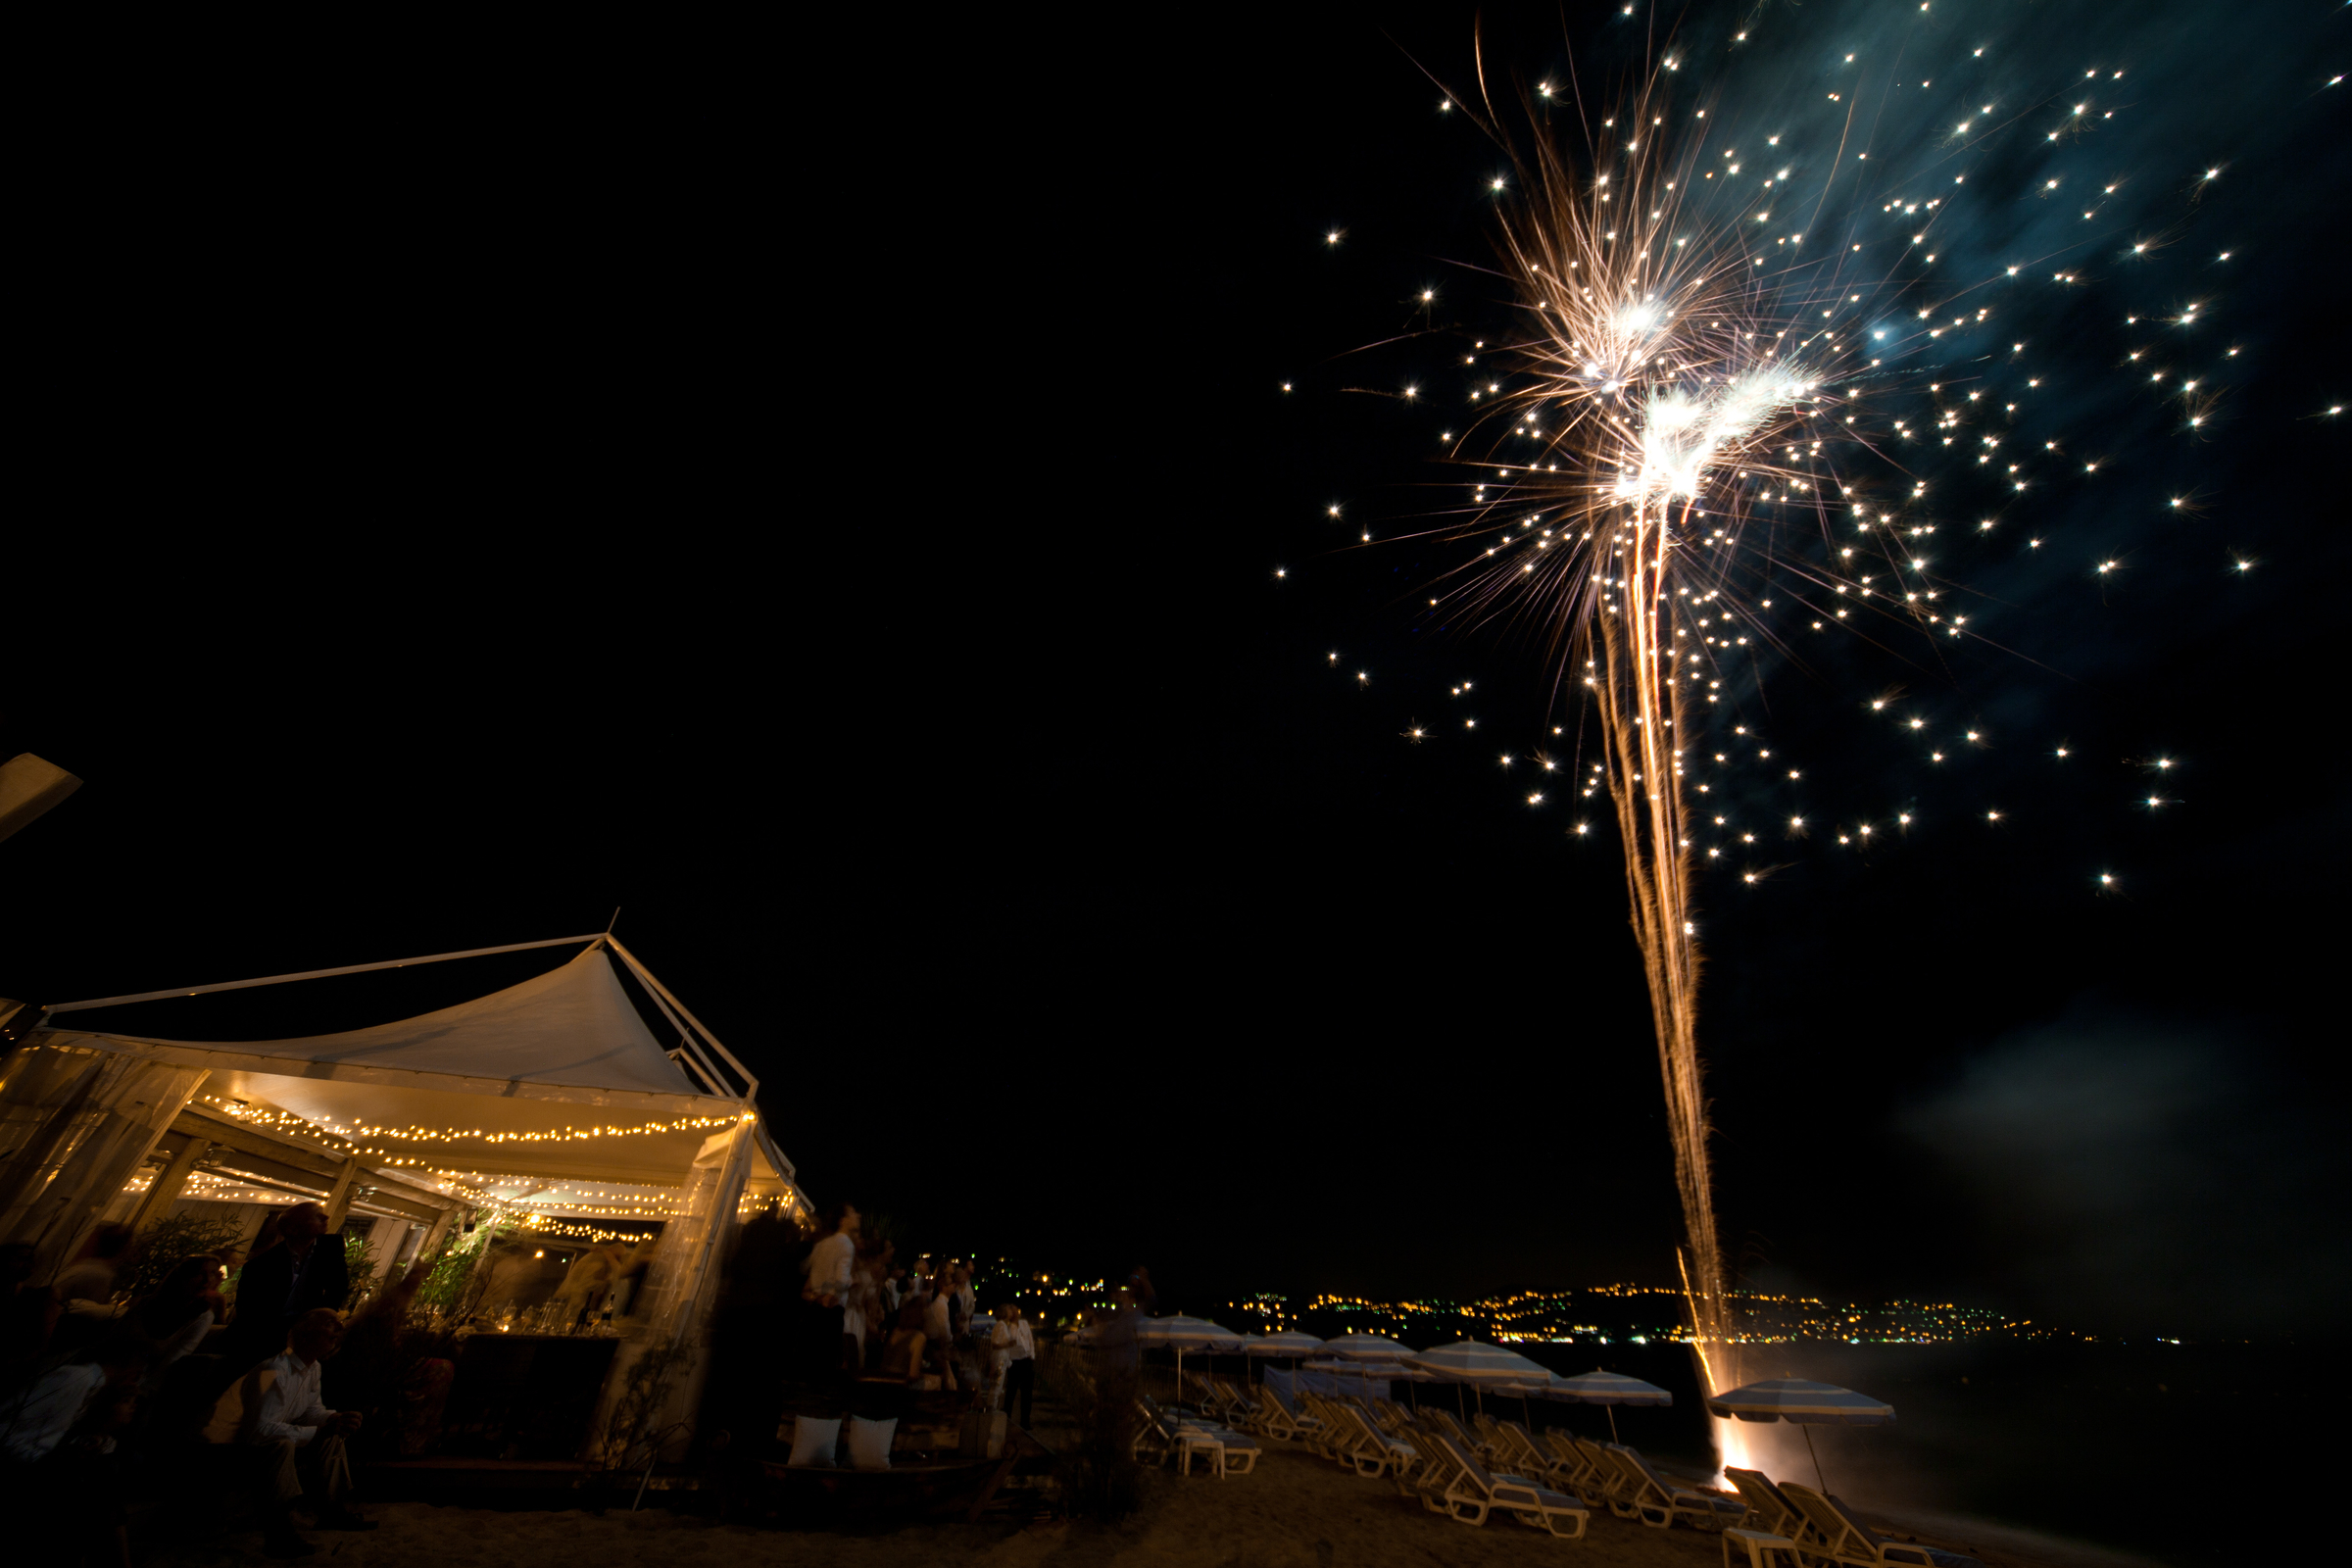 Wedding Fireworks, Cote d'Azur